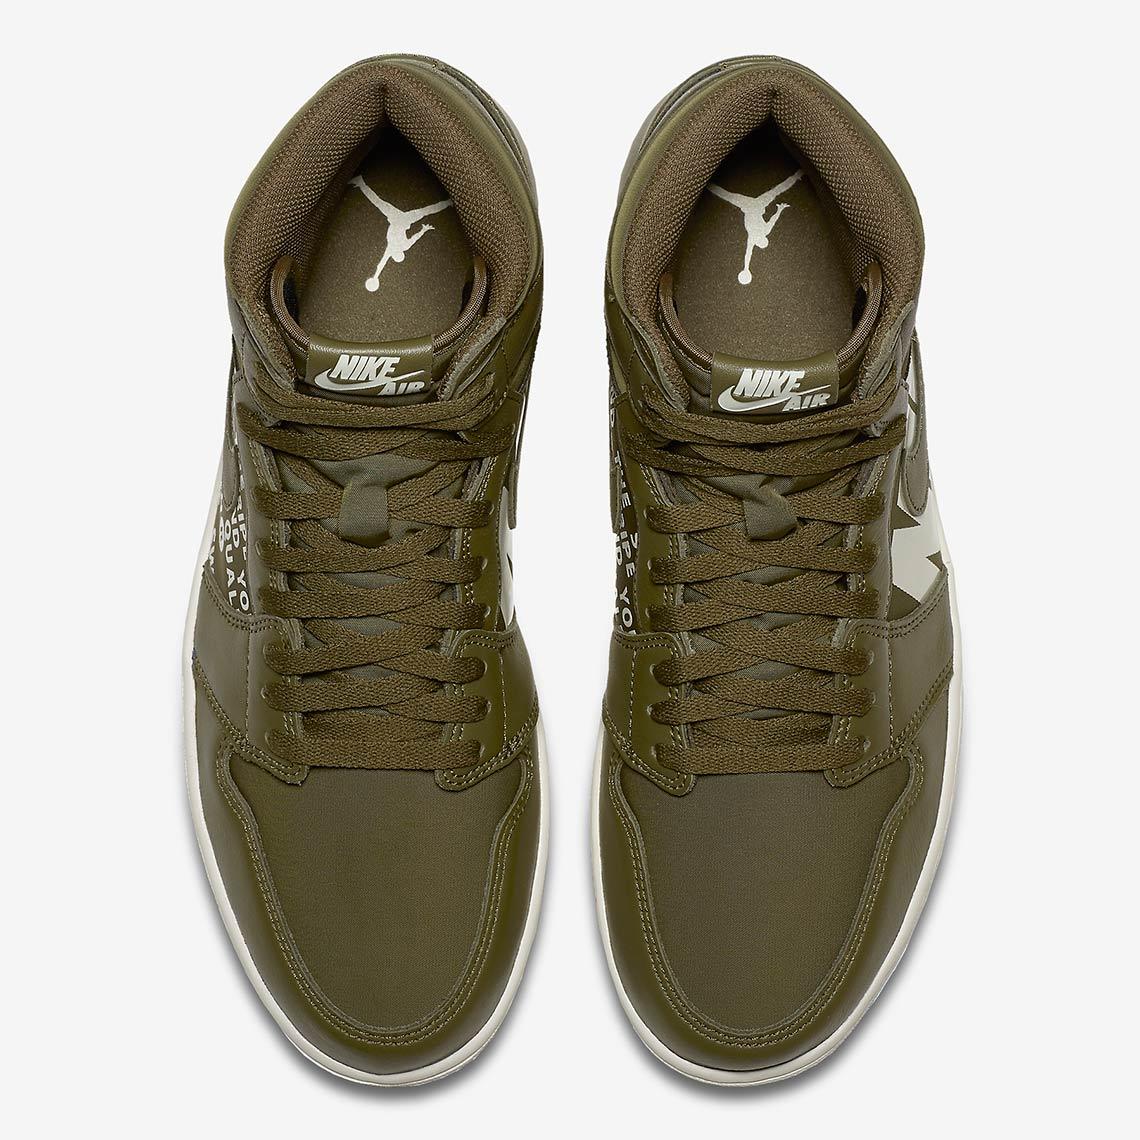 3d8cfdd937 Air Jordan 1 Retro High OG Olive Canvas 555088-300 Release Info ...